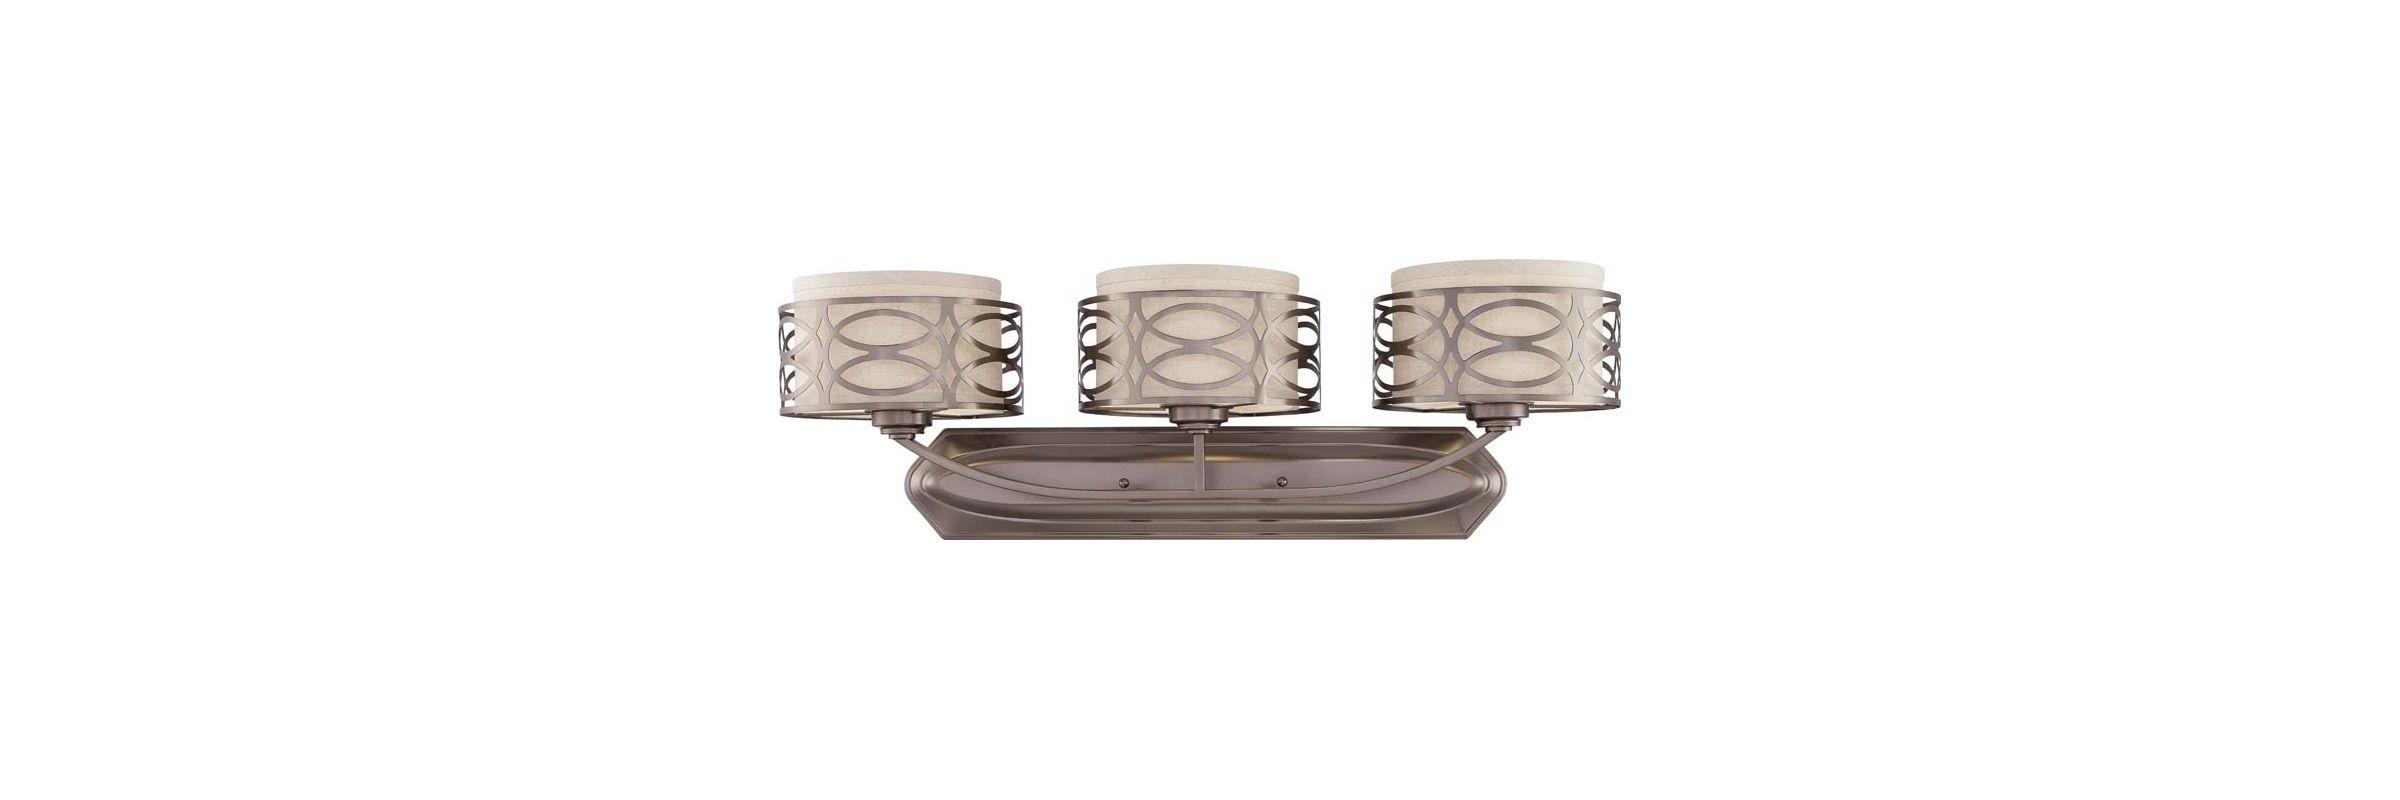 Nuvo Lighting 60/4723 Harlow Three Light Bathroom Fixture with Khaki